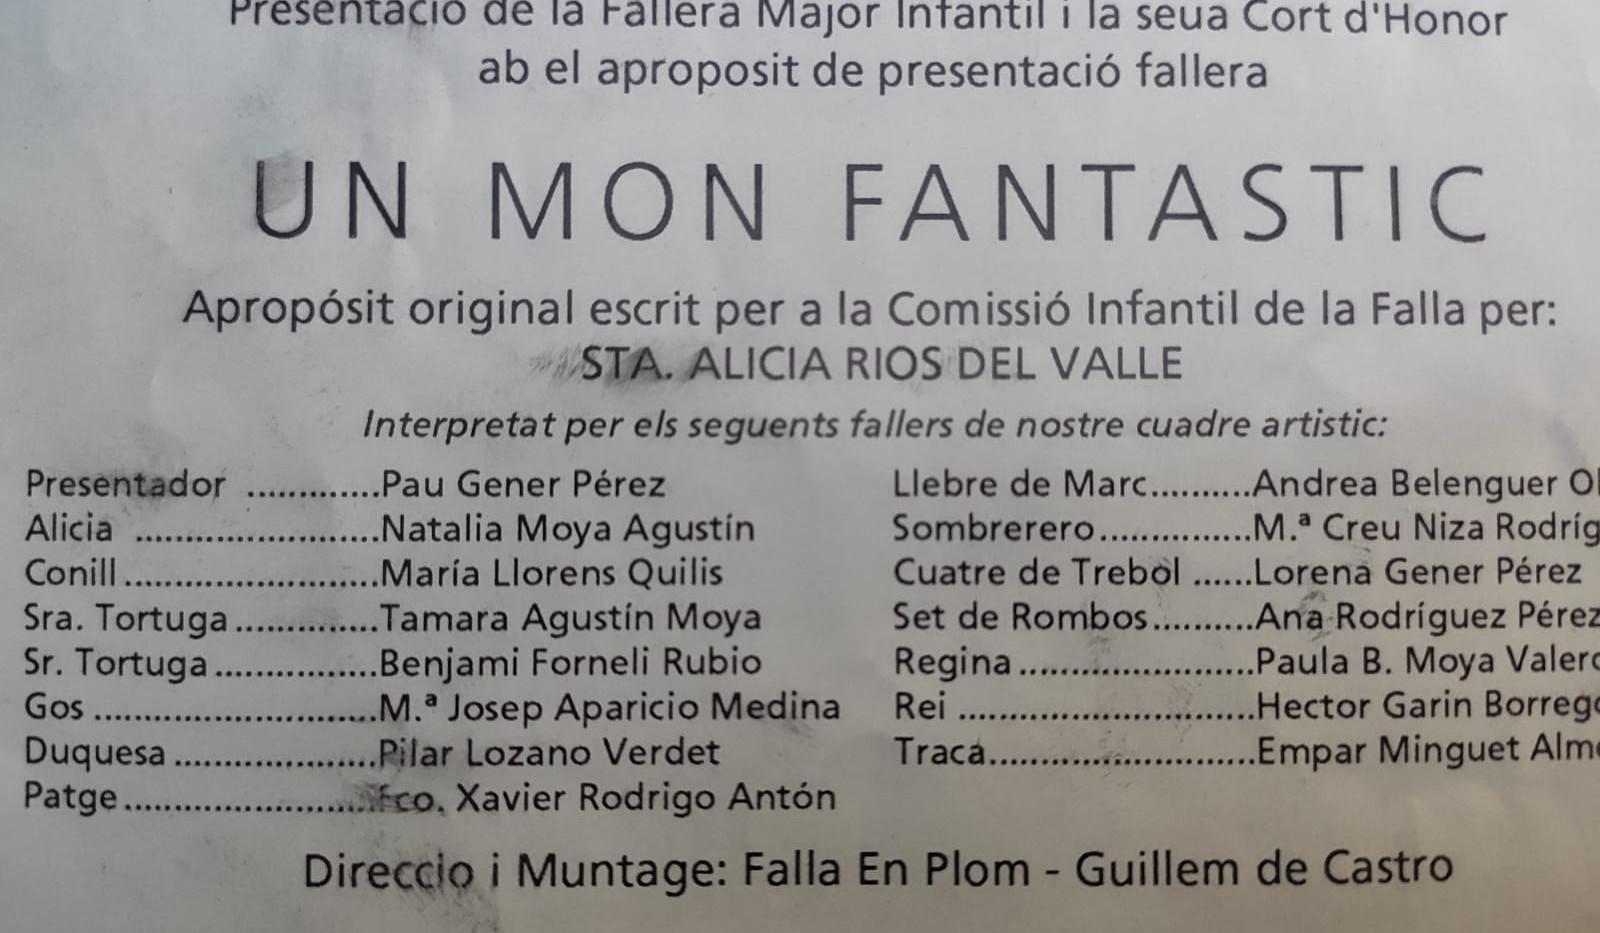 1993_-_Un_món_fantàstic_de_Alicia_Río